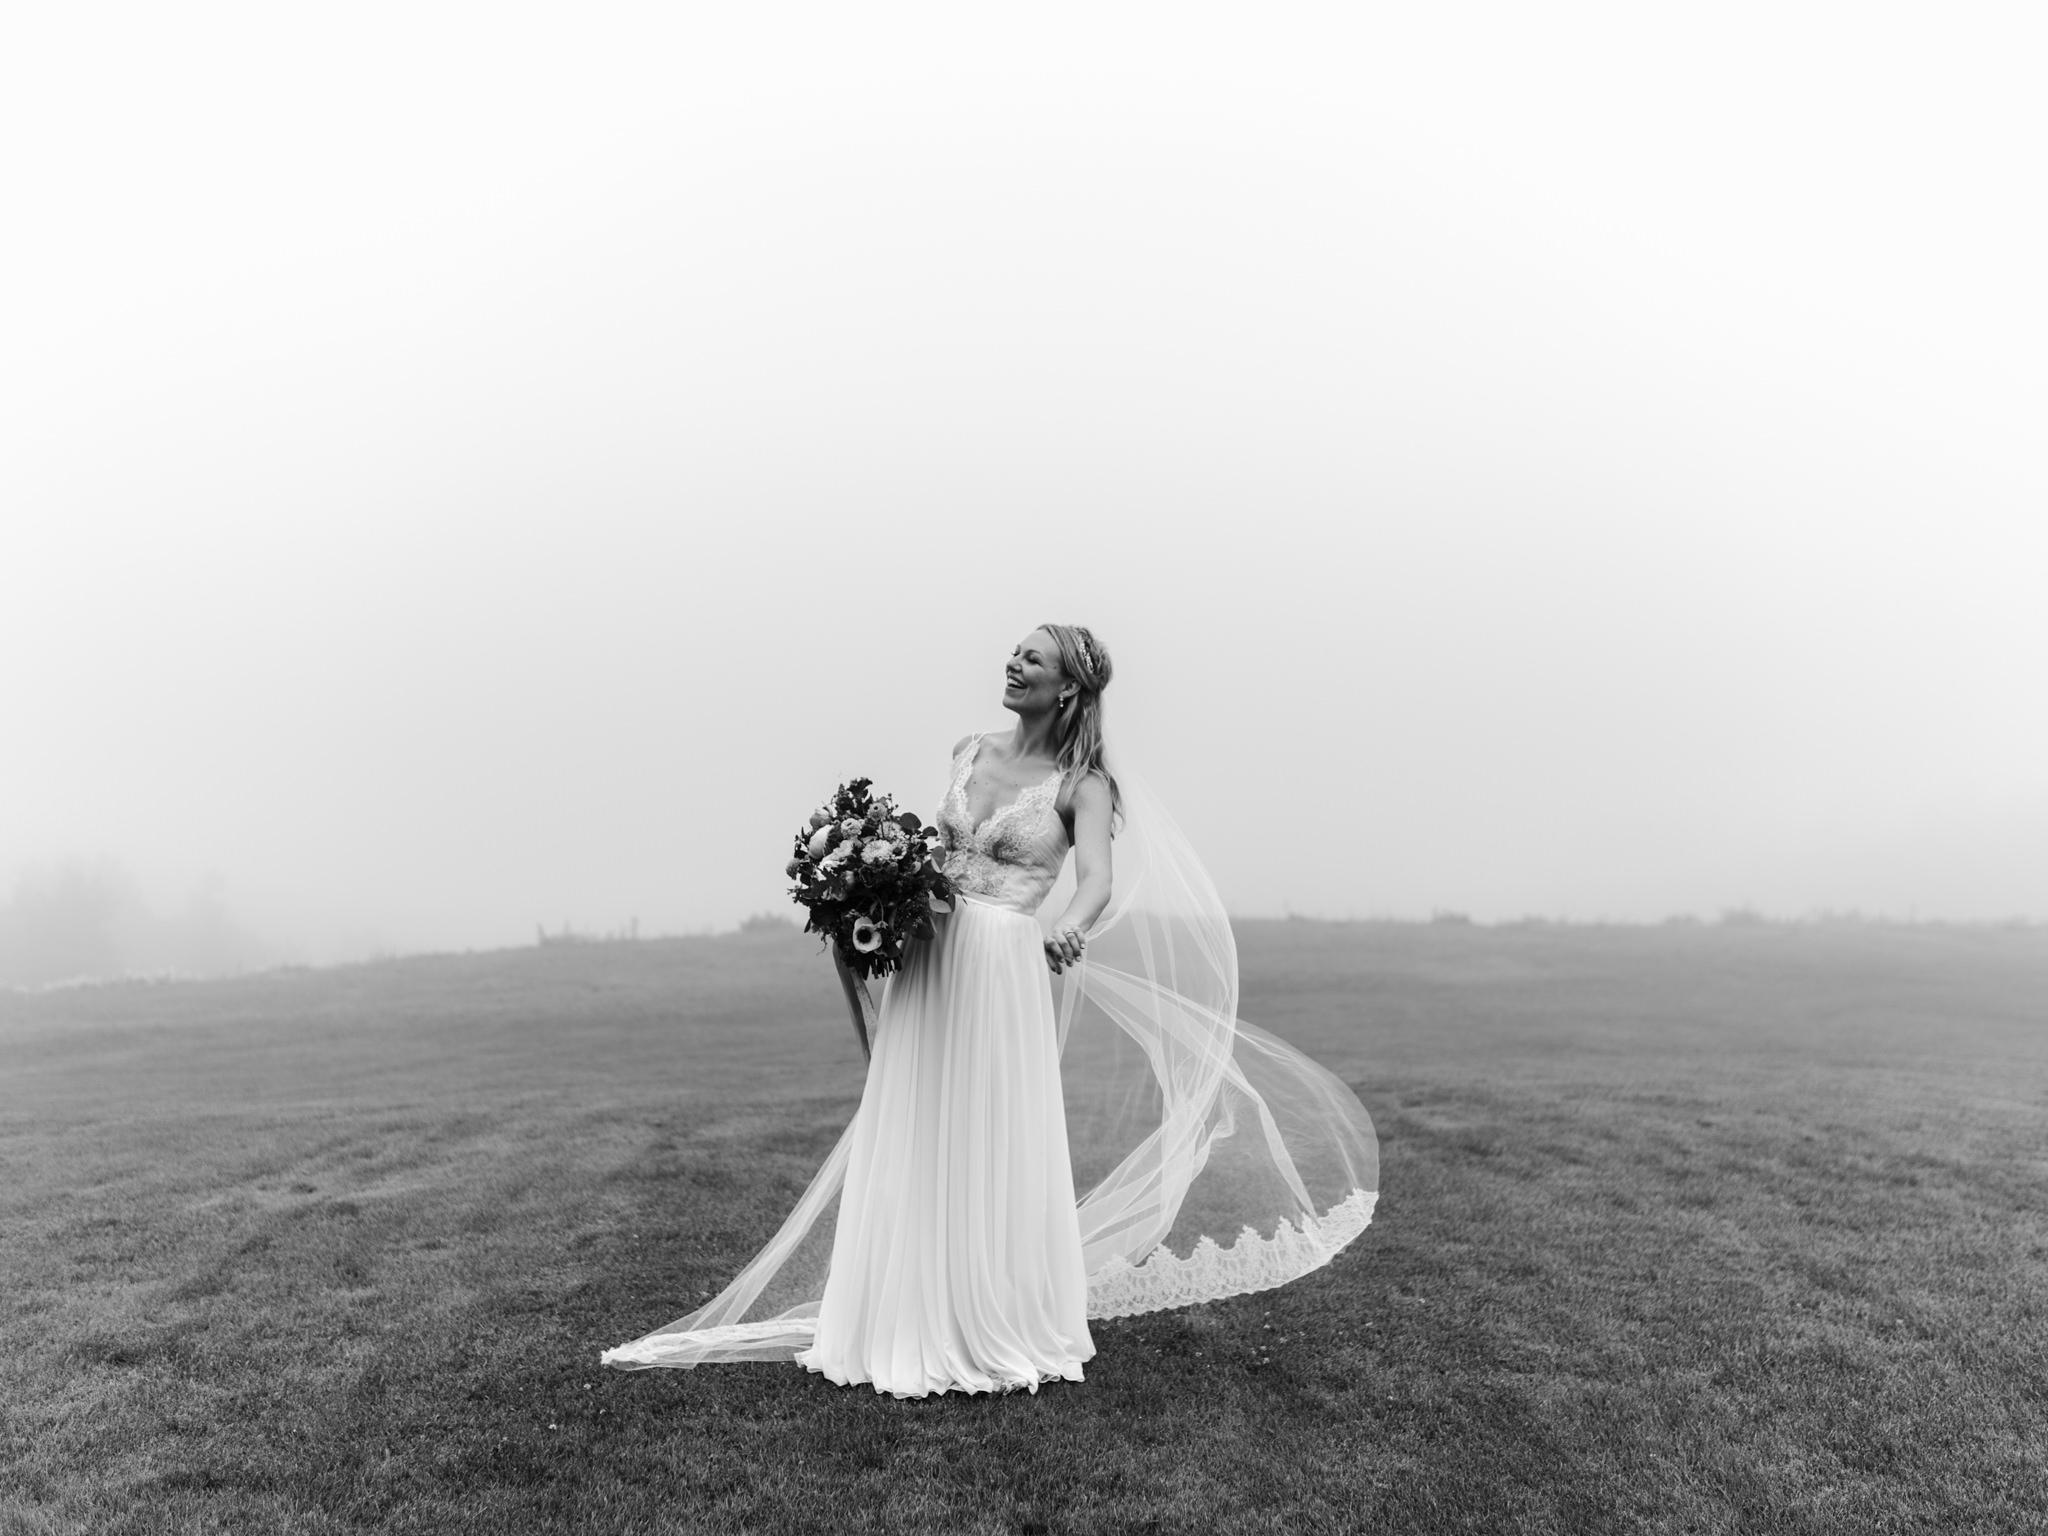 skyloft-wedding-toronto-wedding-photographer-55.jpg